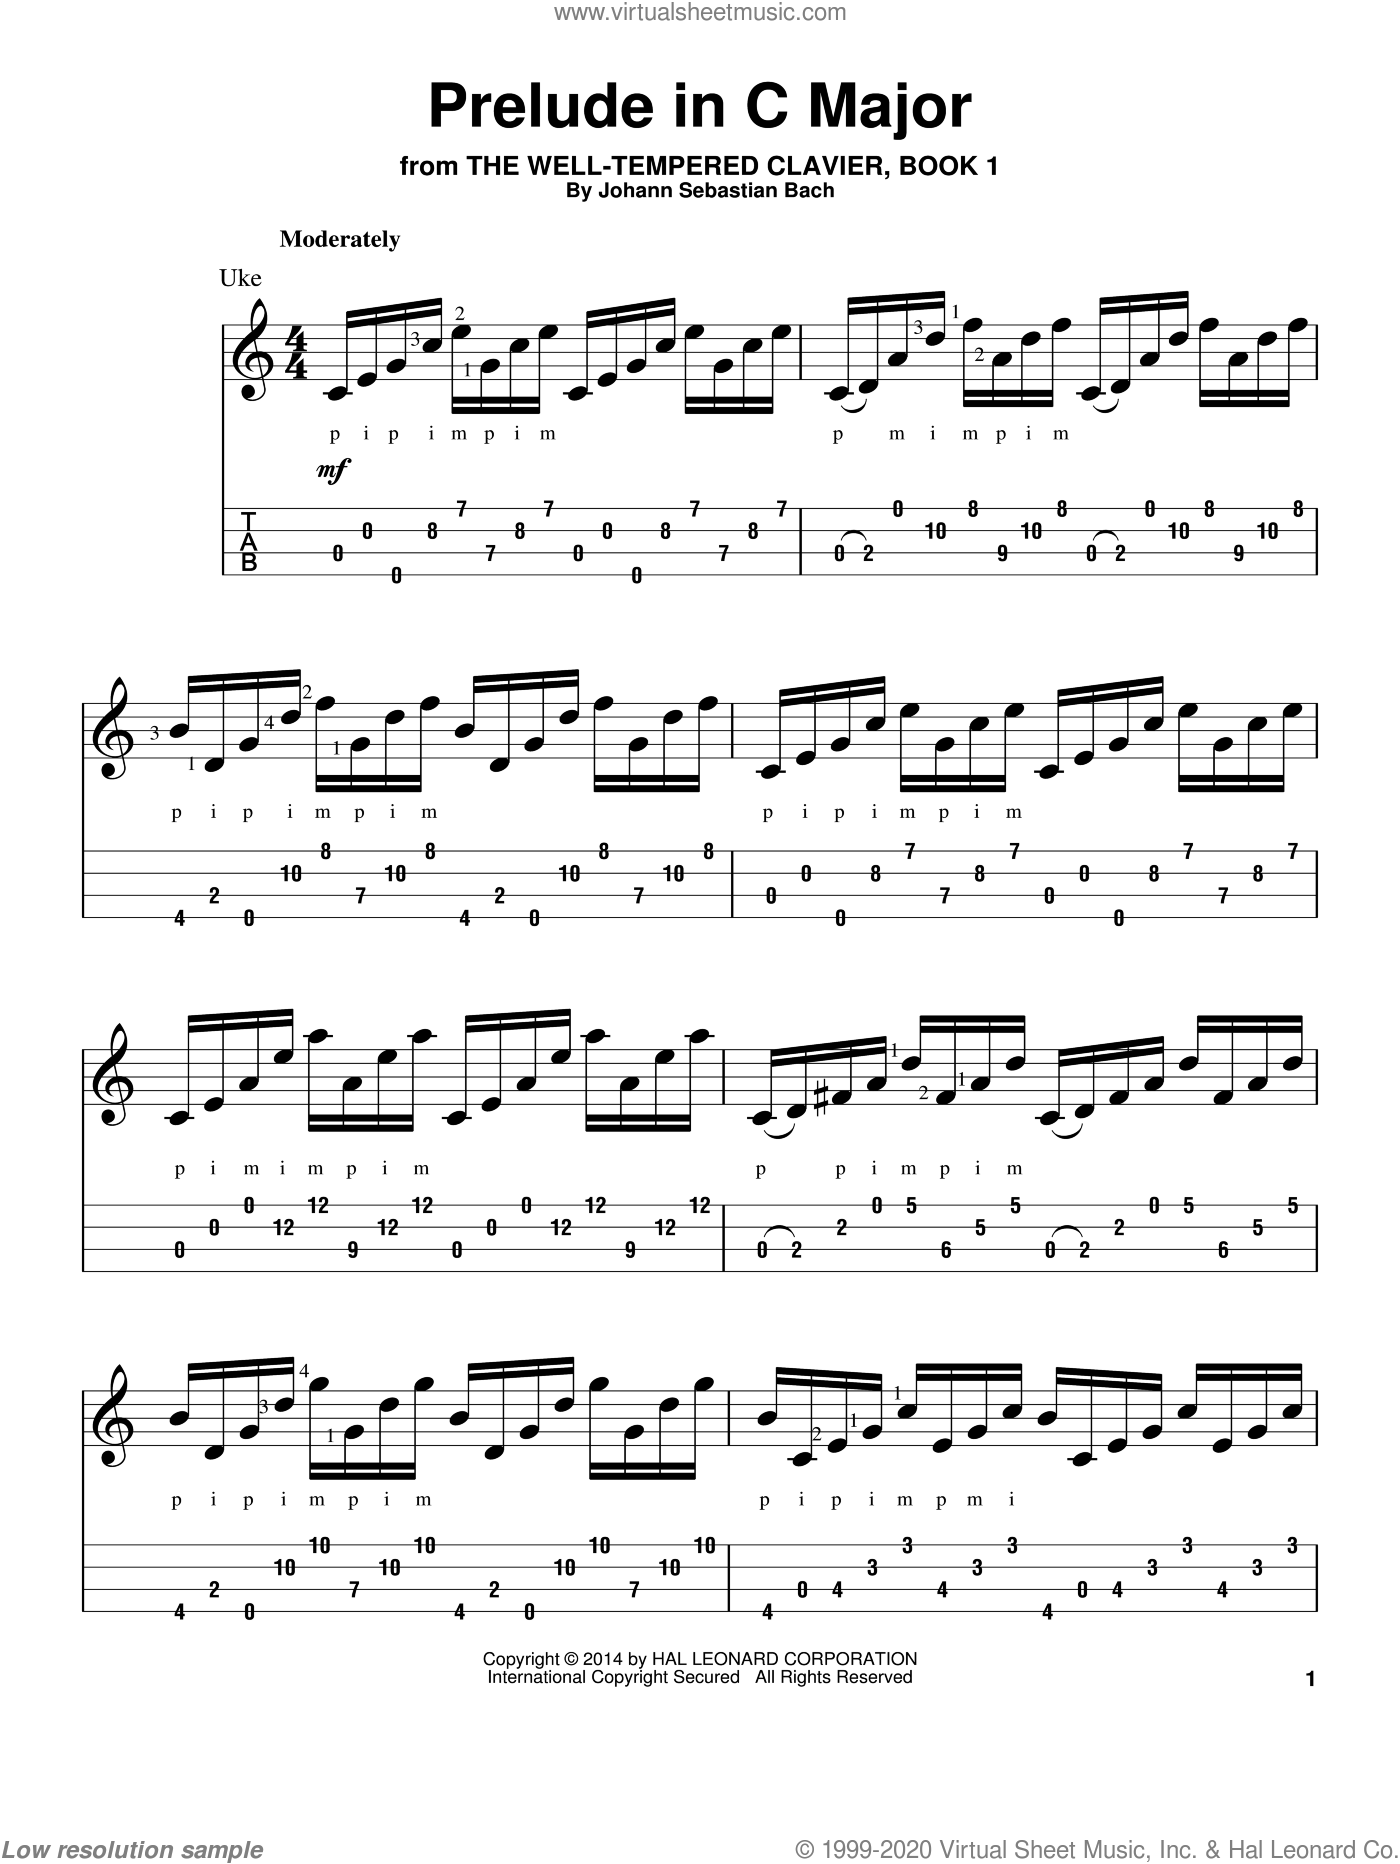 Prelude in C Major sheet music for ukulele by Johann Sebastian Bach, classical score, intermediate skill level